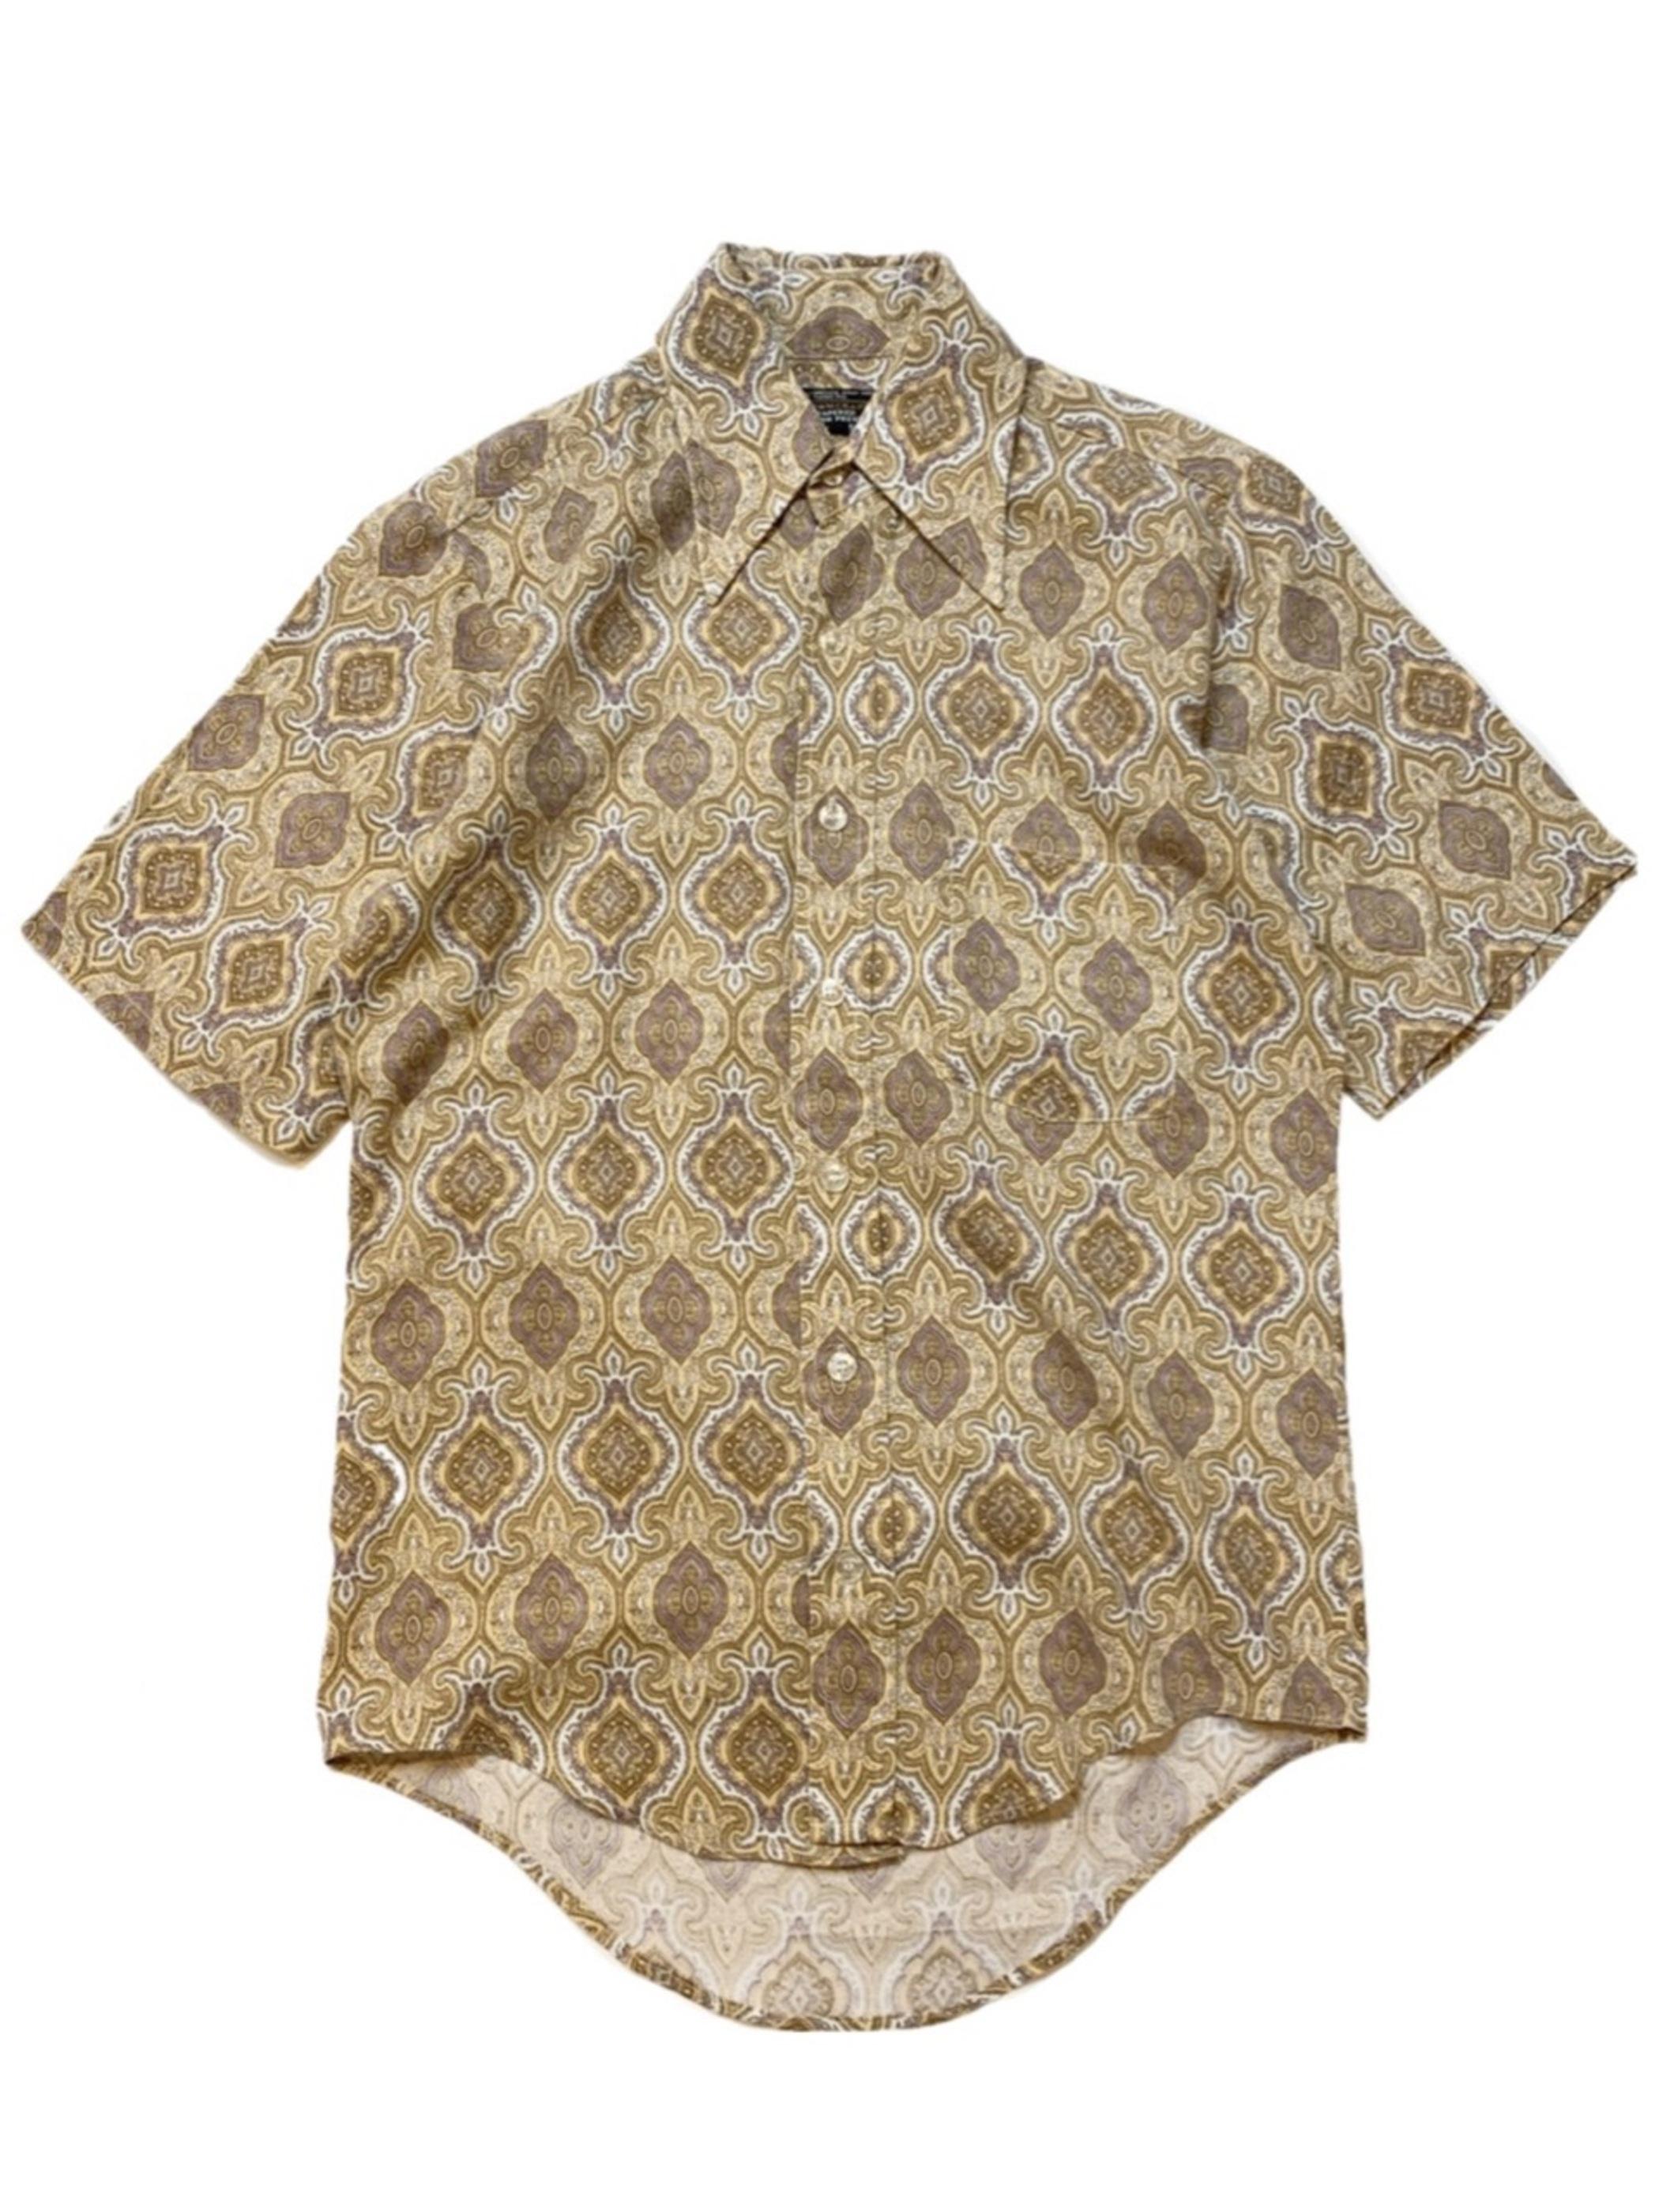 1970's TOWN CRAFT shirt